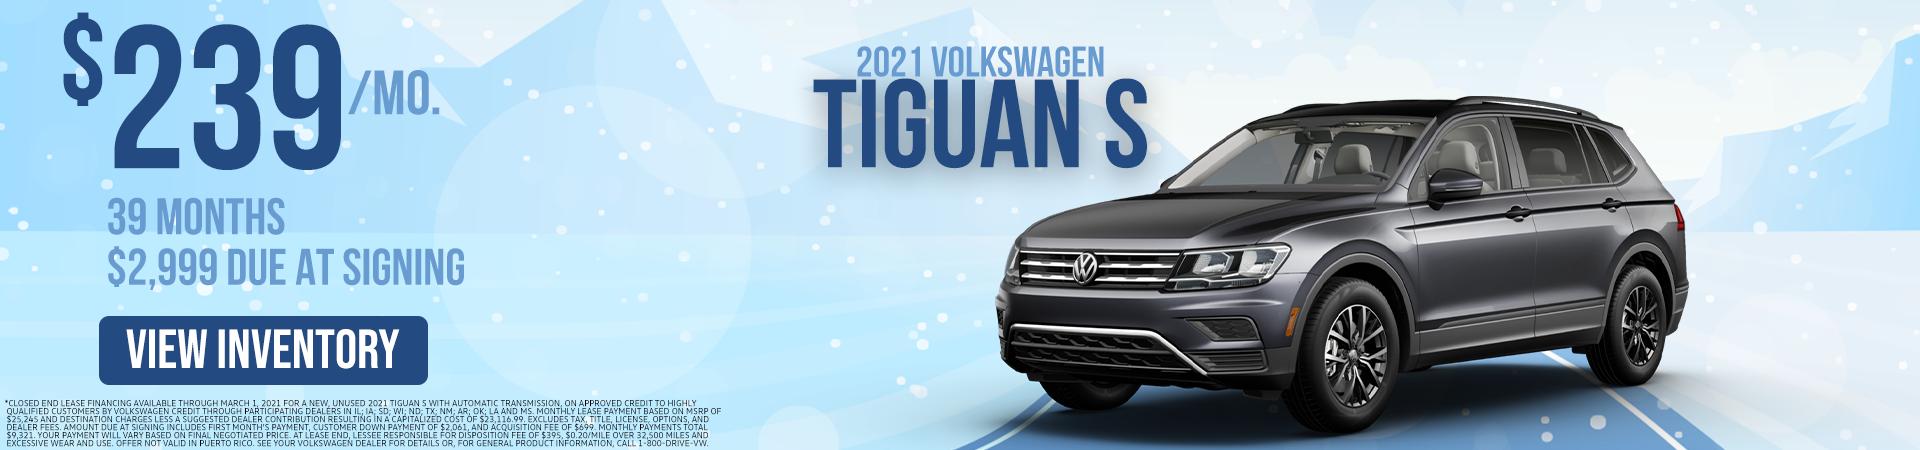 TiguanS-Lease-HomepageBanners-VWMarion-Feb2021-DI